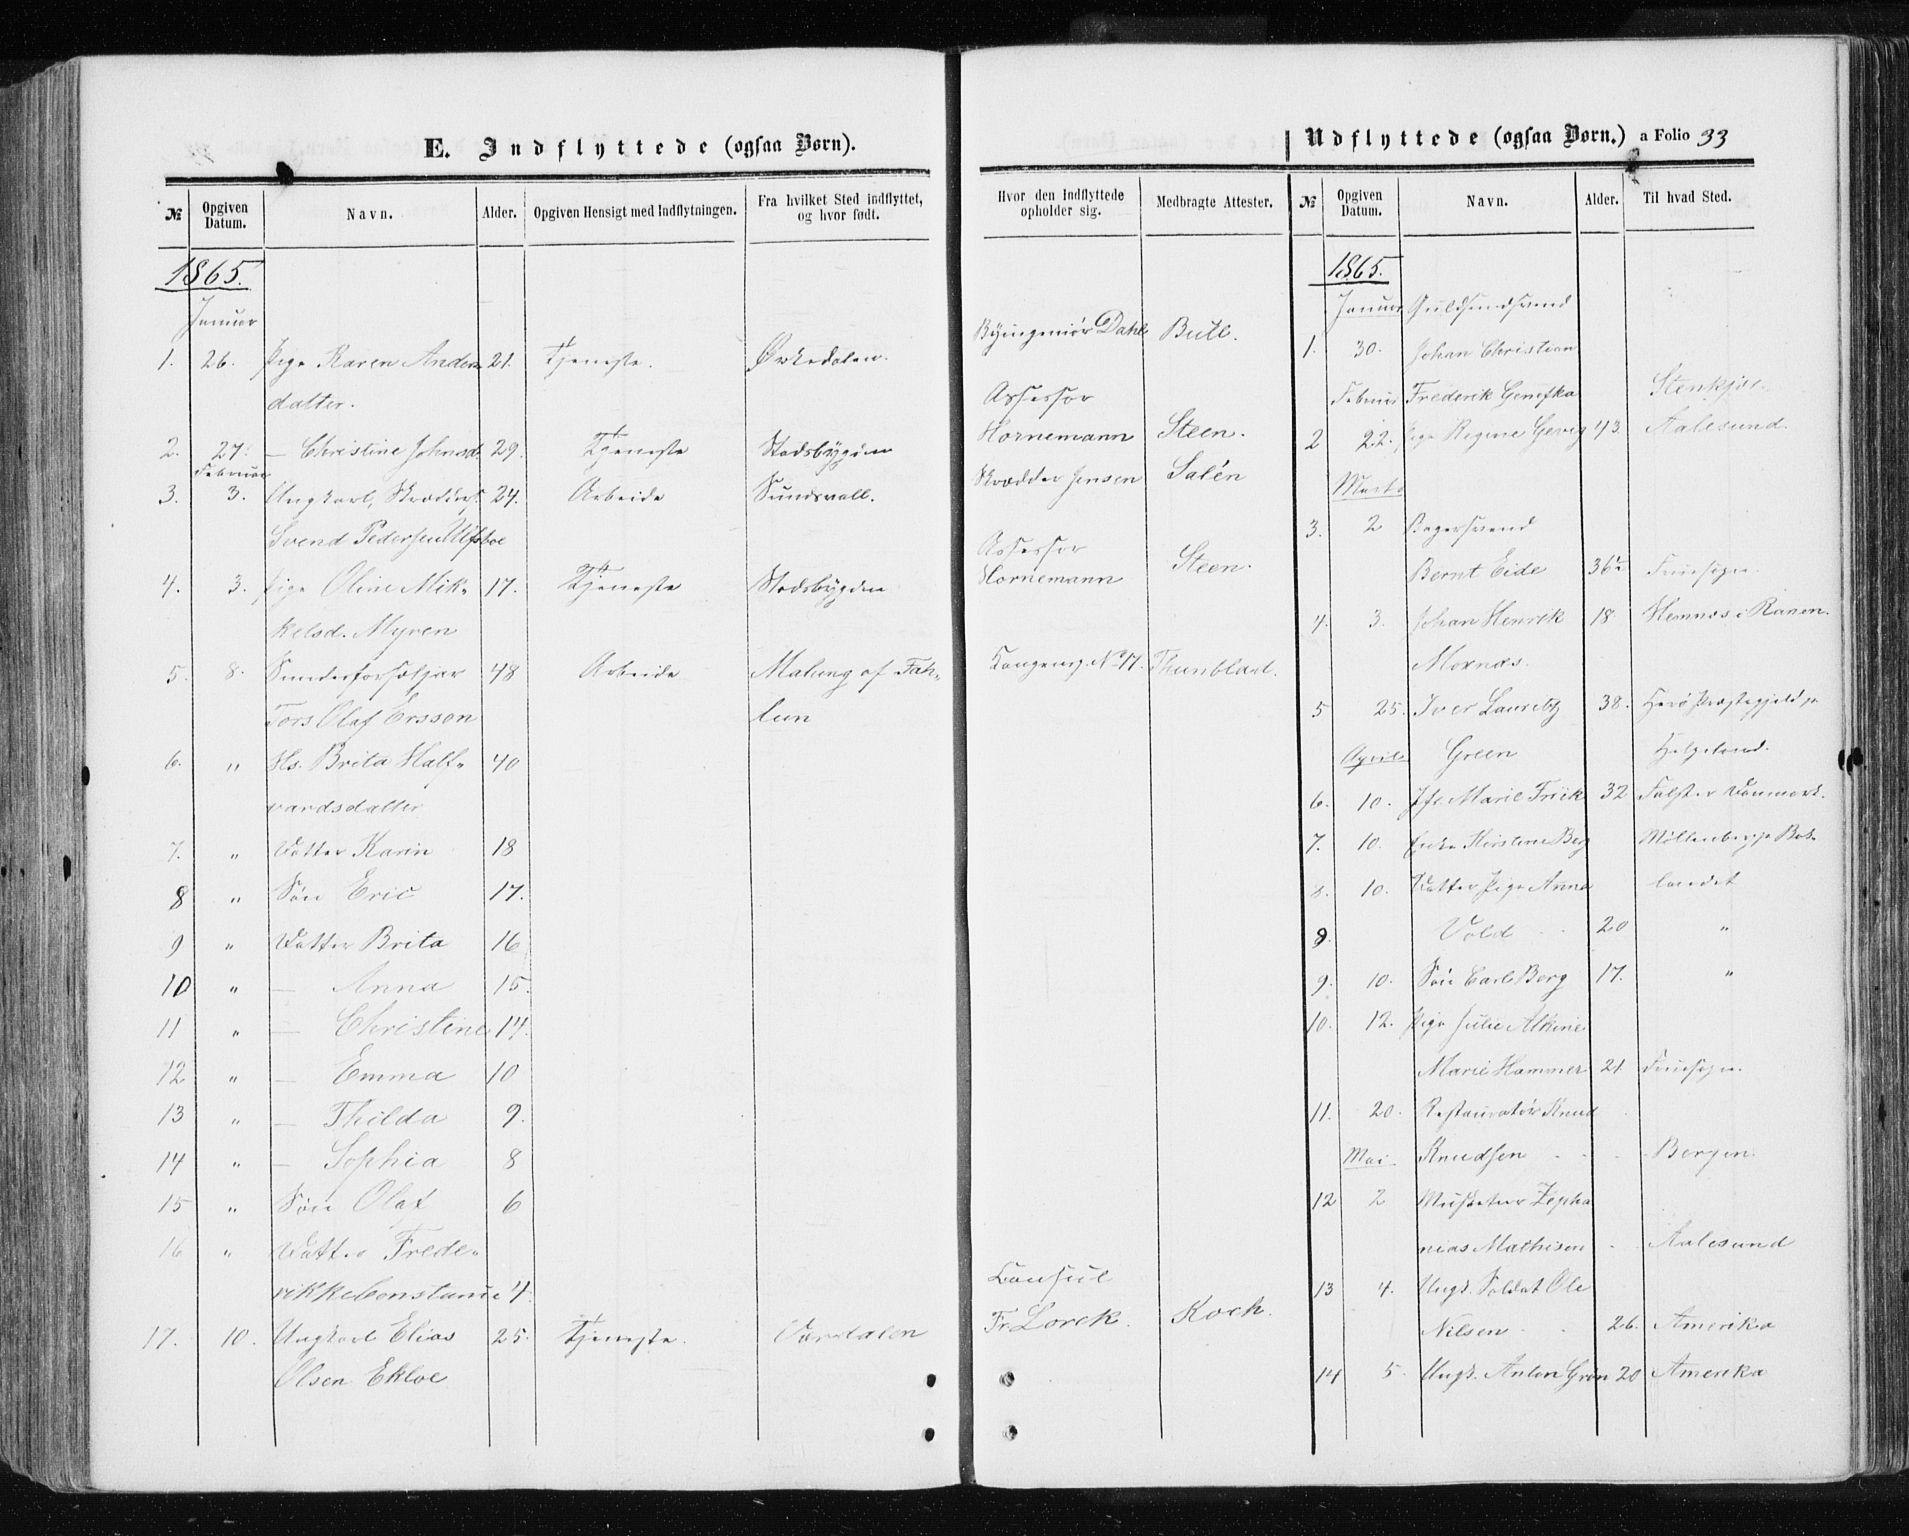 SAT, Ministerialprotokoller, klokkerbøker og fødselsregistre - Sør-Trøndelag, 601/L0053: Parish register (official) no. 601A21, 1857-1865, p. 33